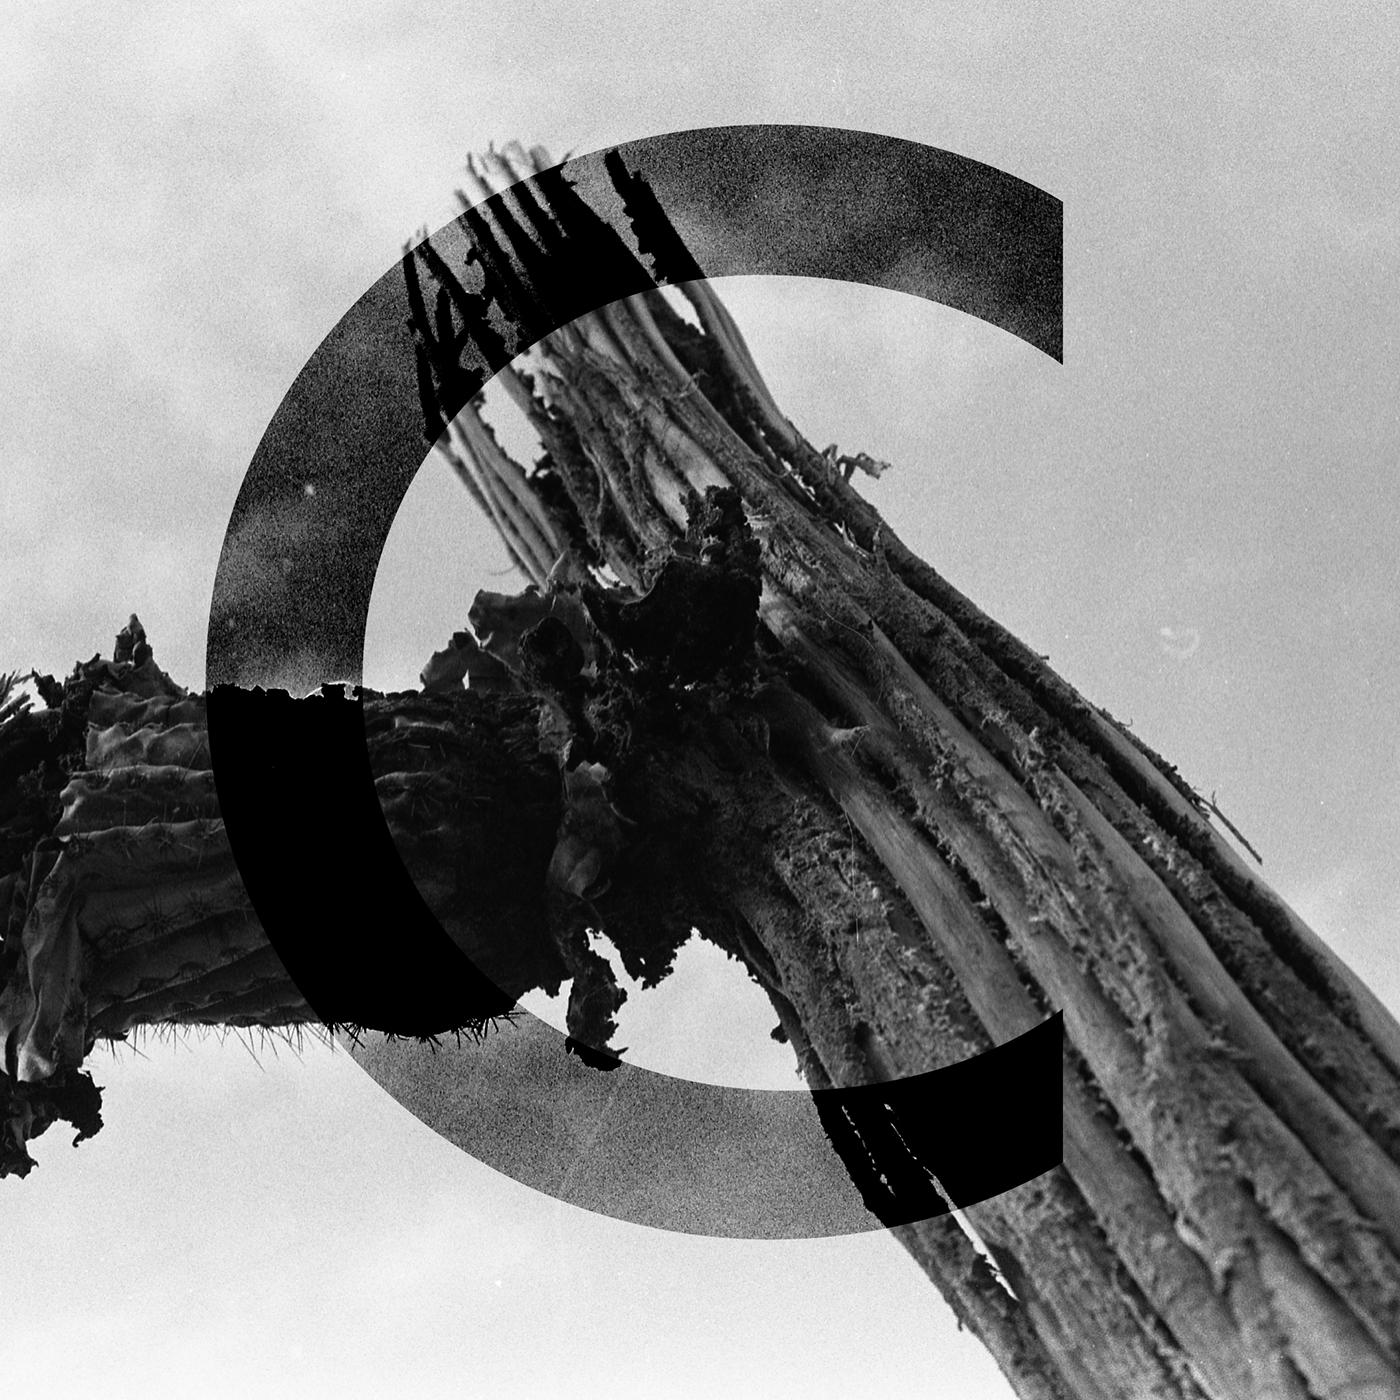 Capital C Photographic Illuminated Illustrated. Film photograph with digital manipulation.